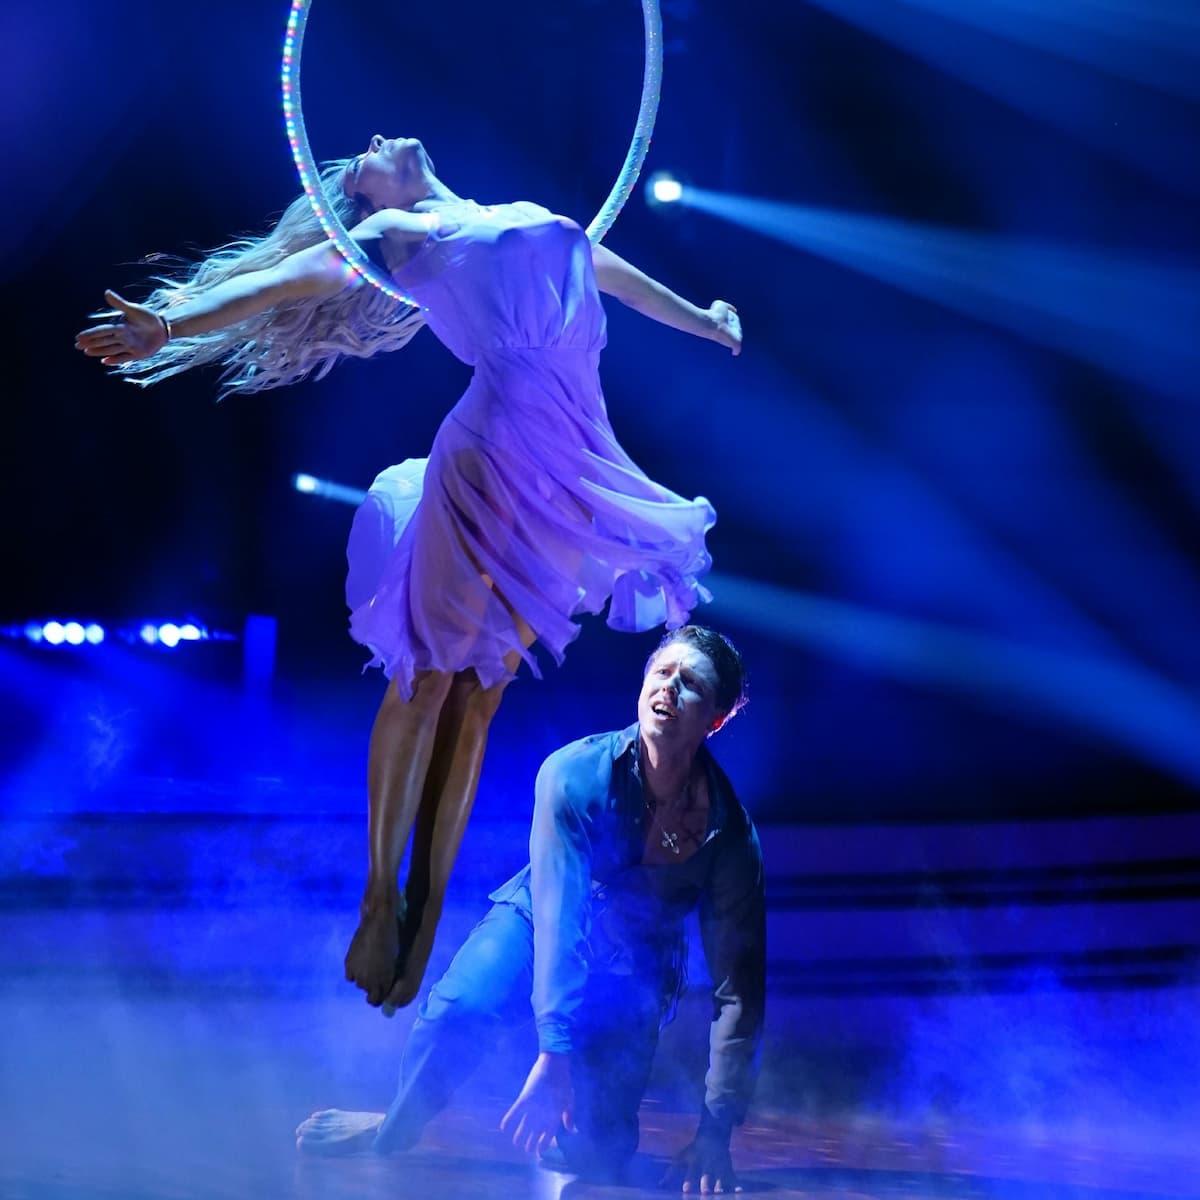 Valentina Pahde mit Valentin Lusin beim Contemporary Let's dance 14.5.2021